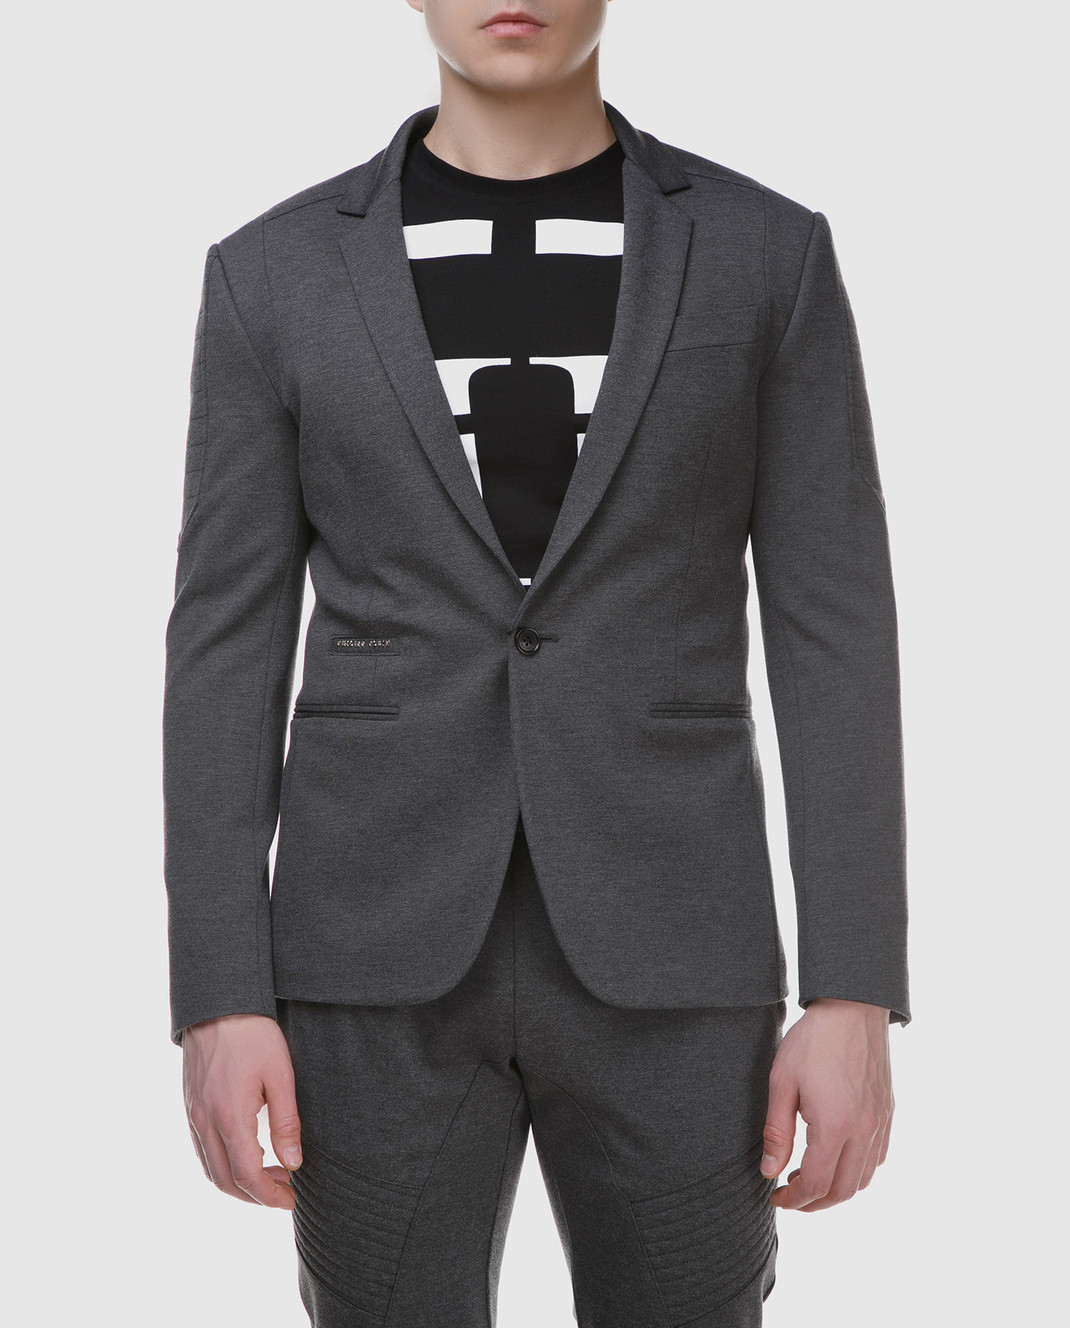 Philipp Plein Серый пиджак MRF0323 изображение 3